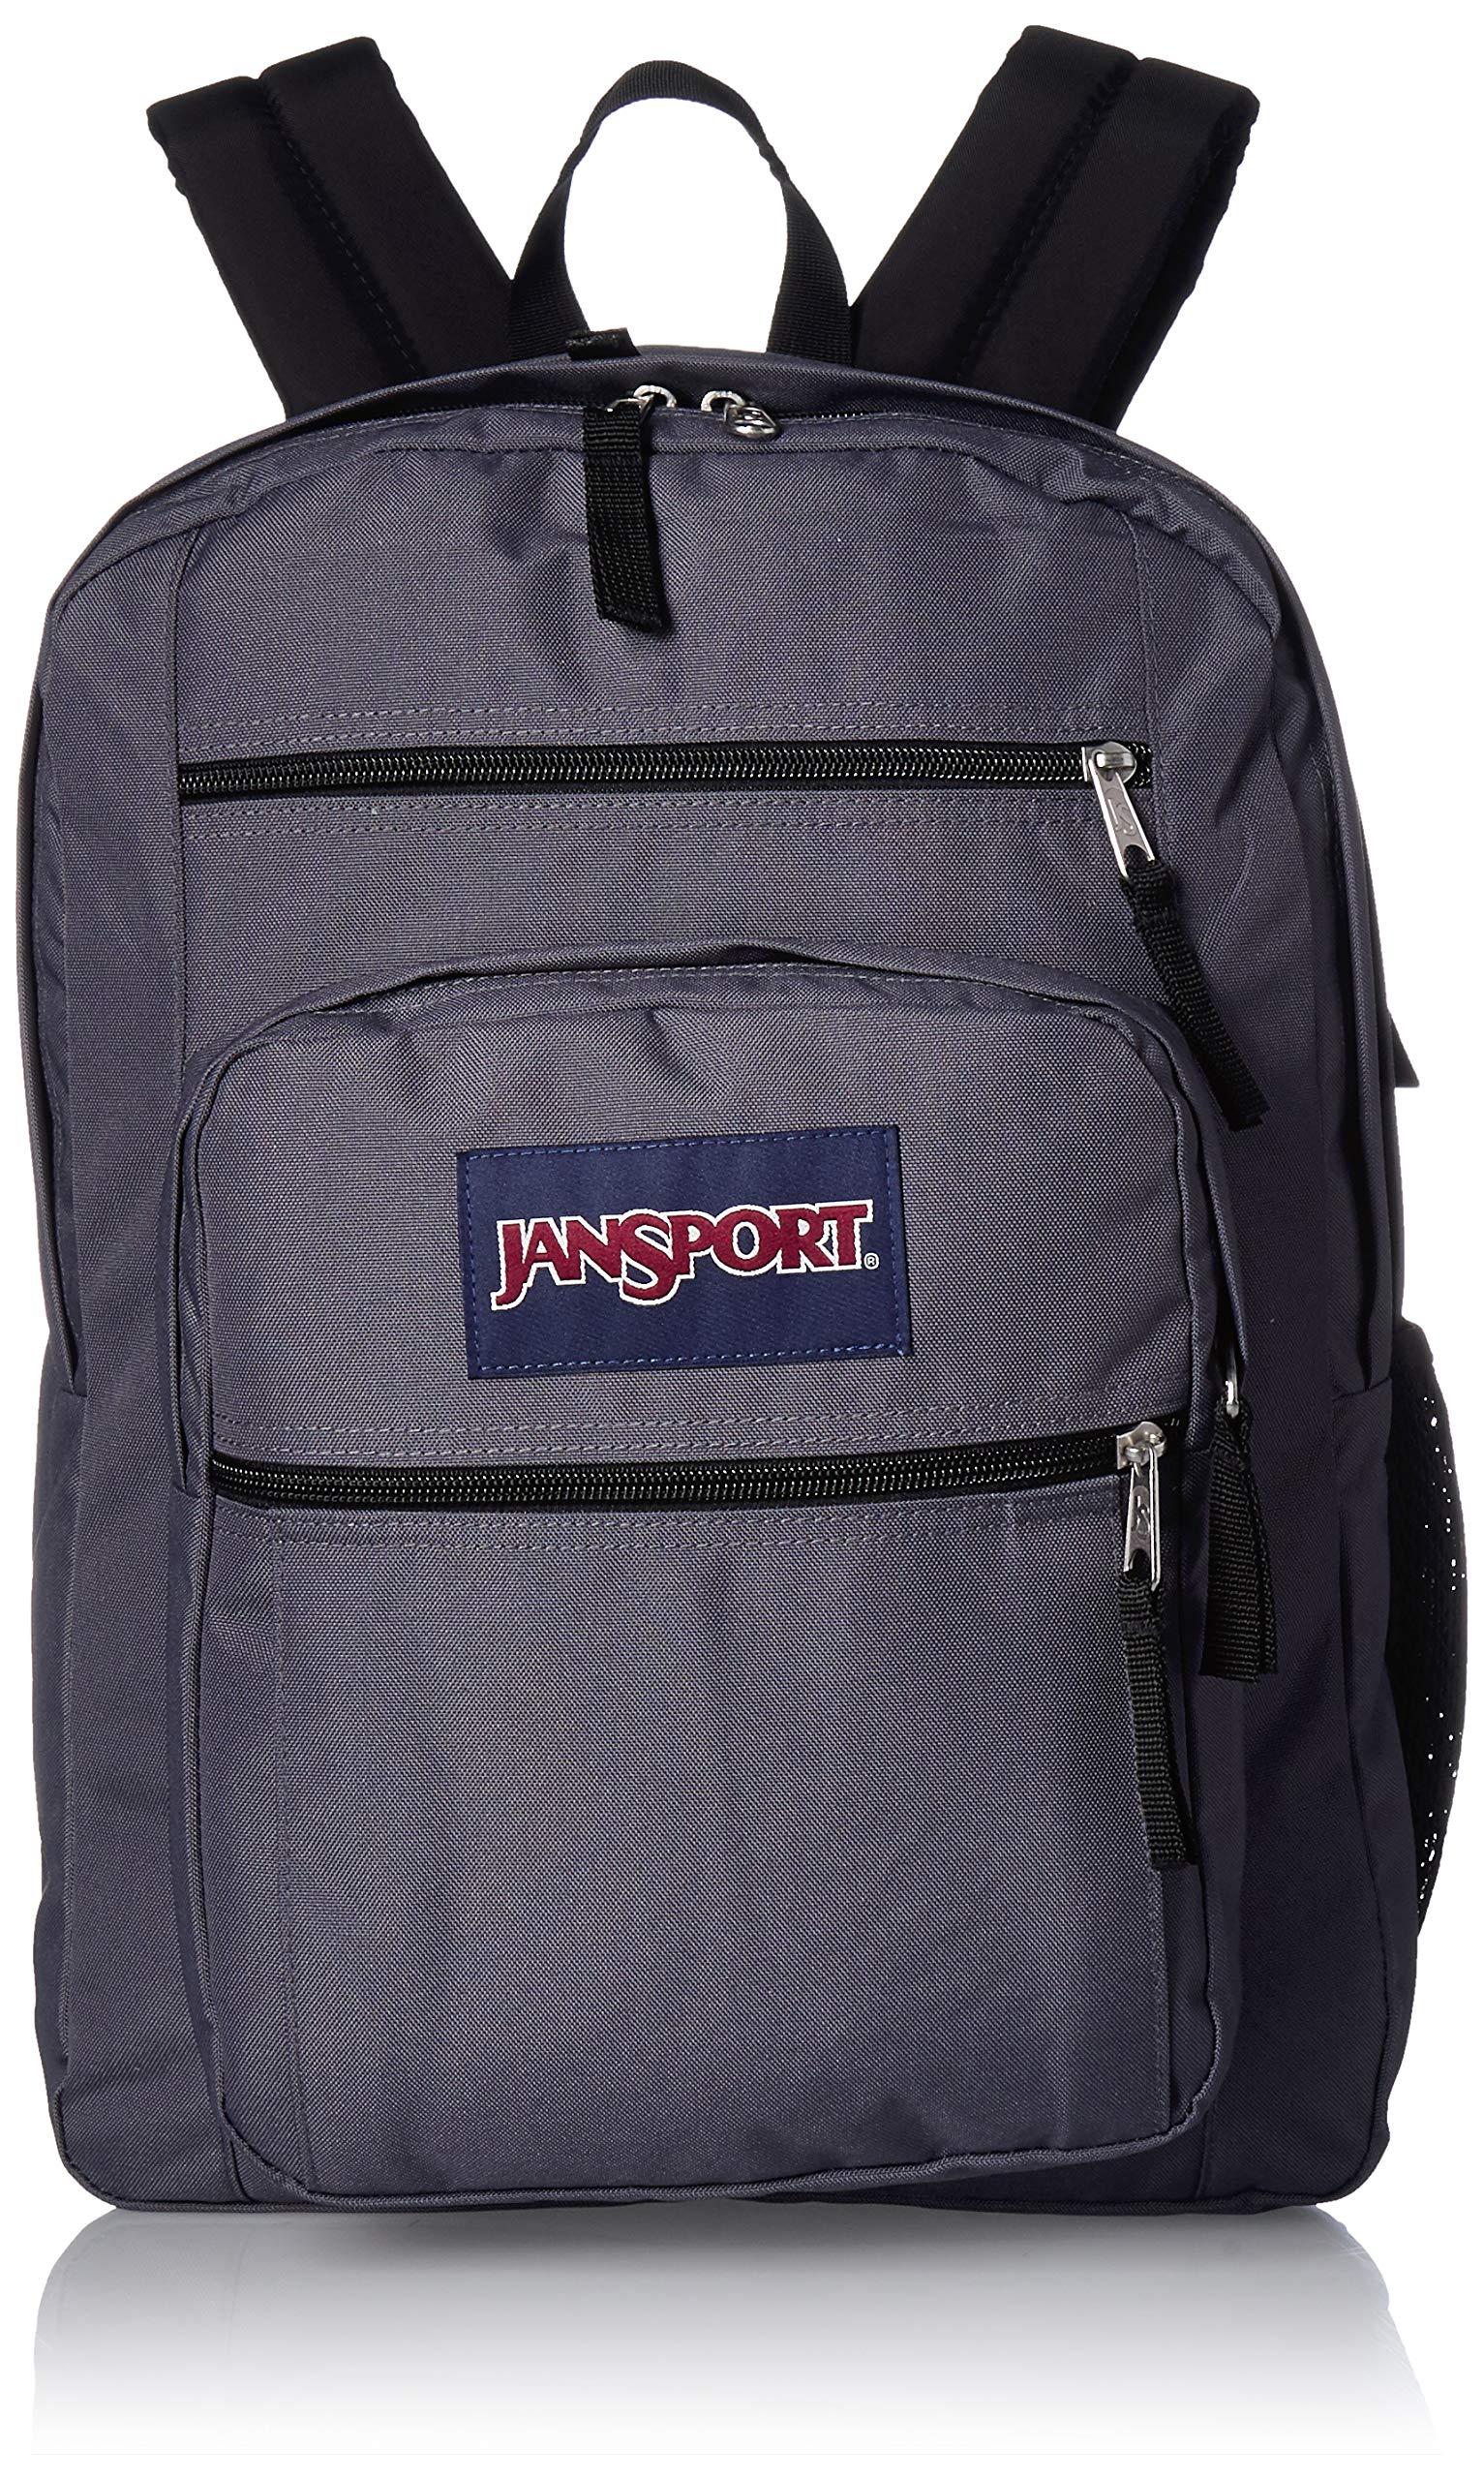 JanSport Big Student Backpack - 15-inch Laptop School Pack, Deep Grey by JanSport